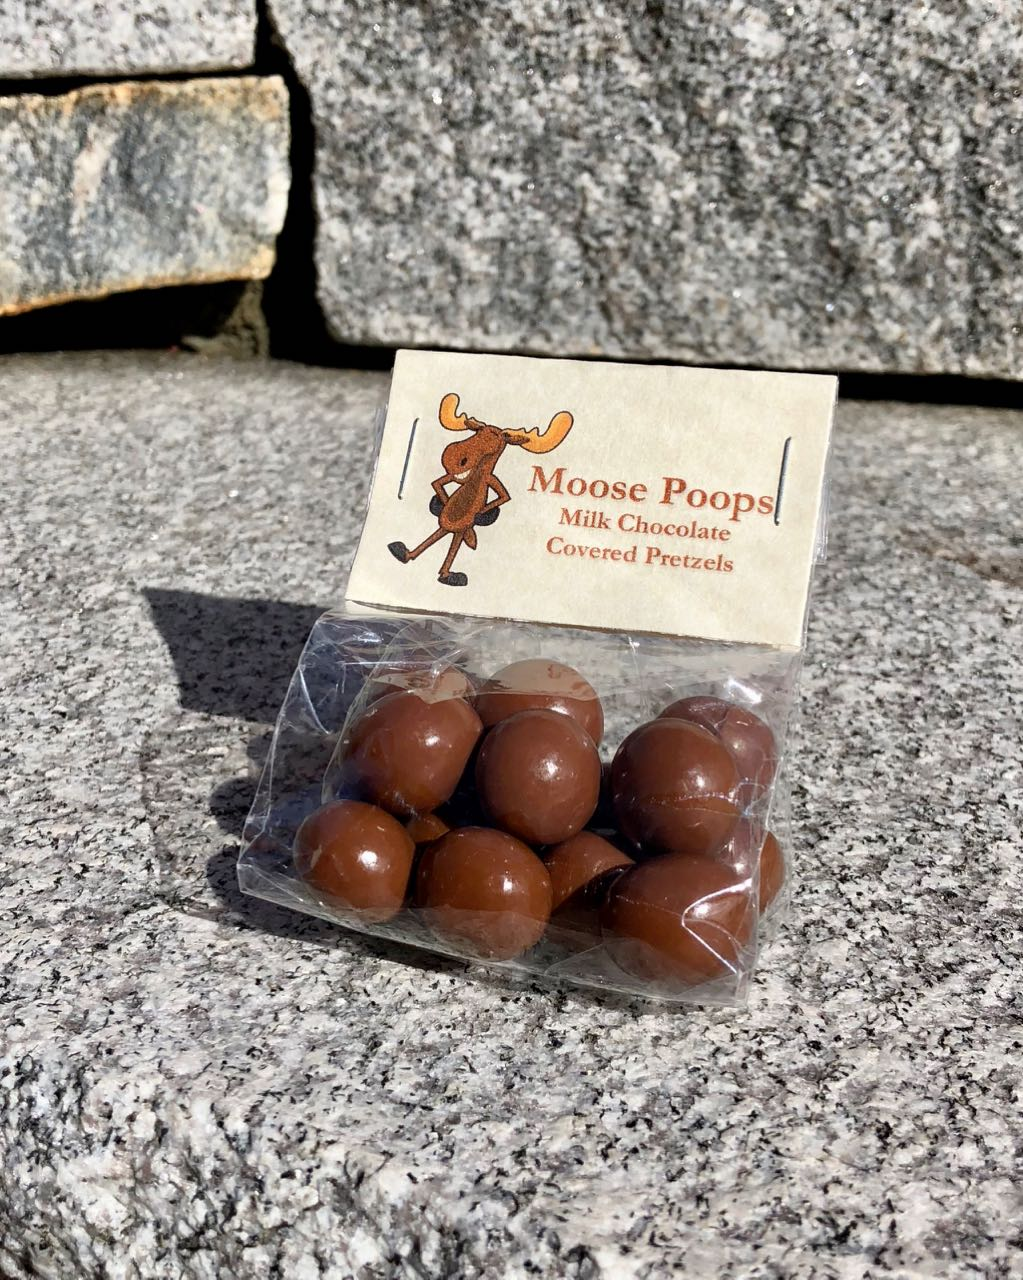 Moose Poop Candy - Milk Chocolate Covered Pretzel